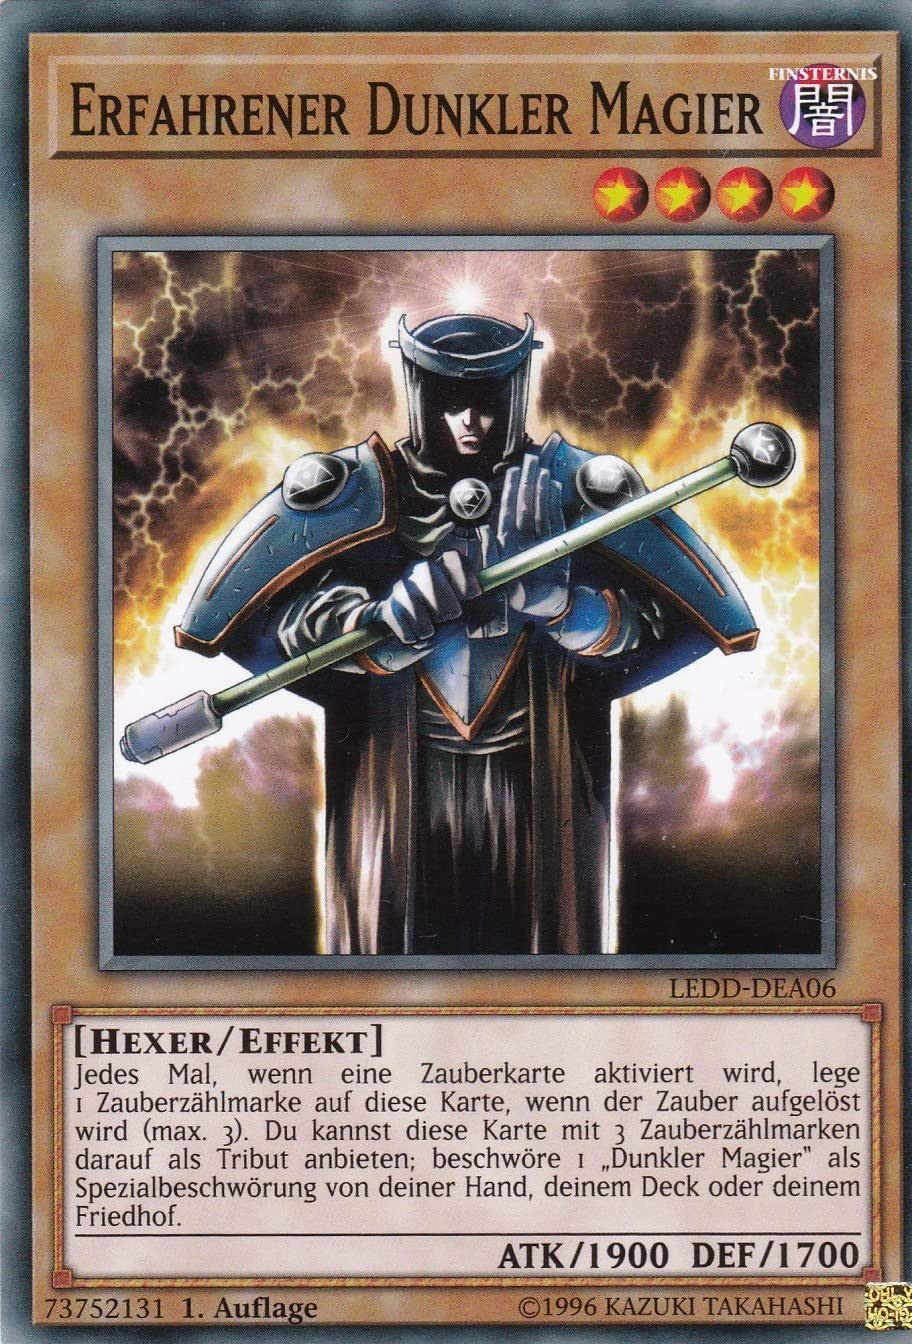 Yu-Gi-Oh! LEDD-DEA06 Common Konami TCG Erfahrener Dunkler Magier mit GECO/® Versandschutz